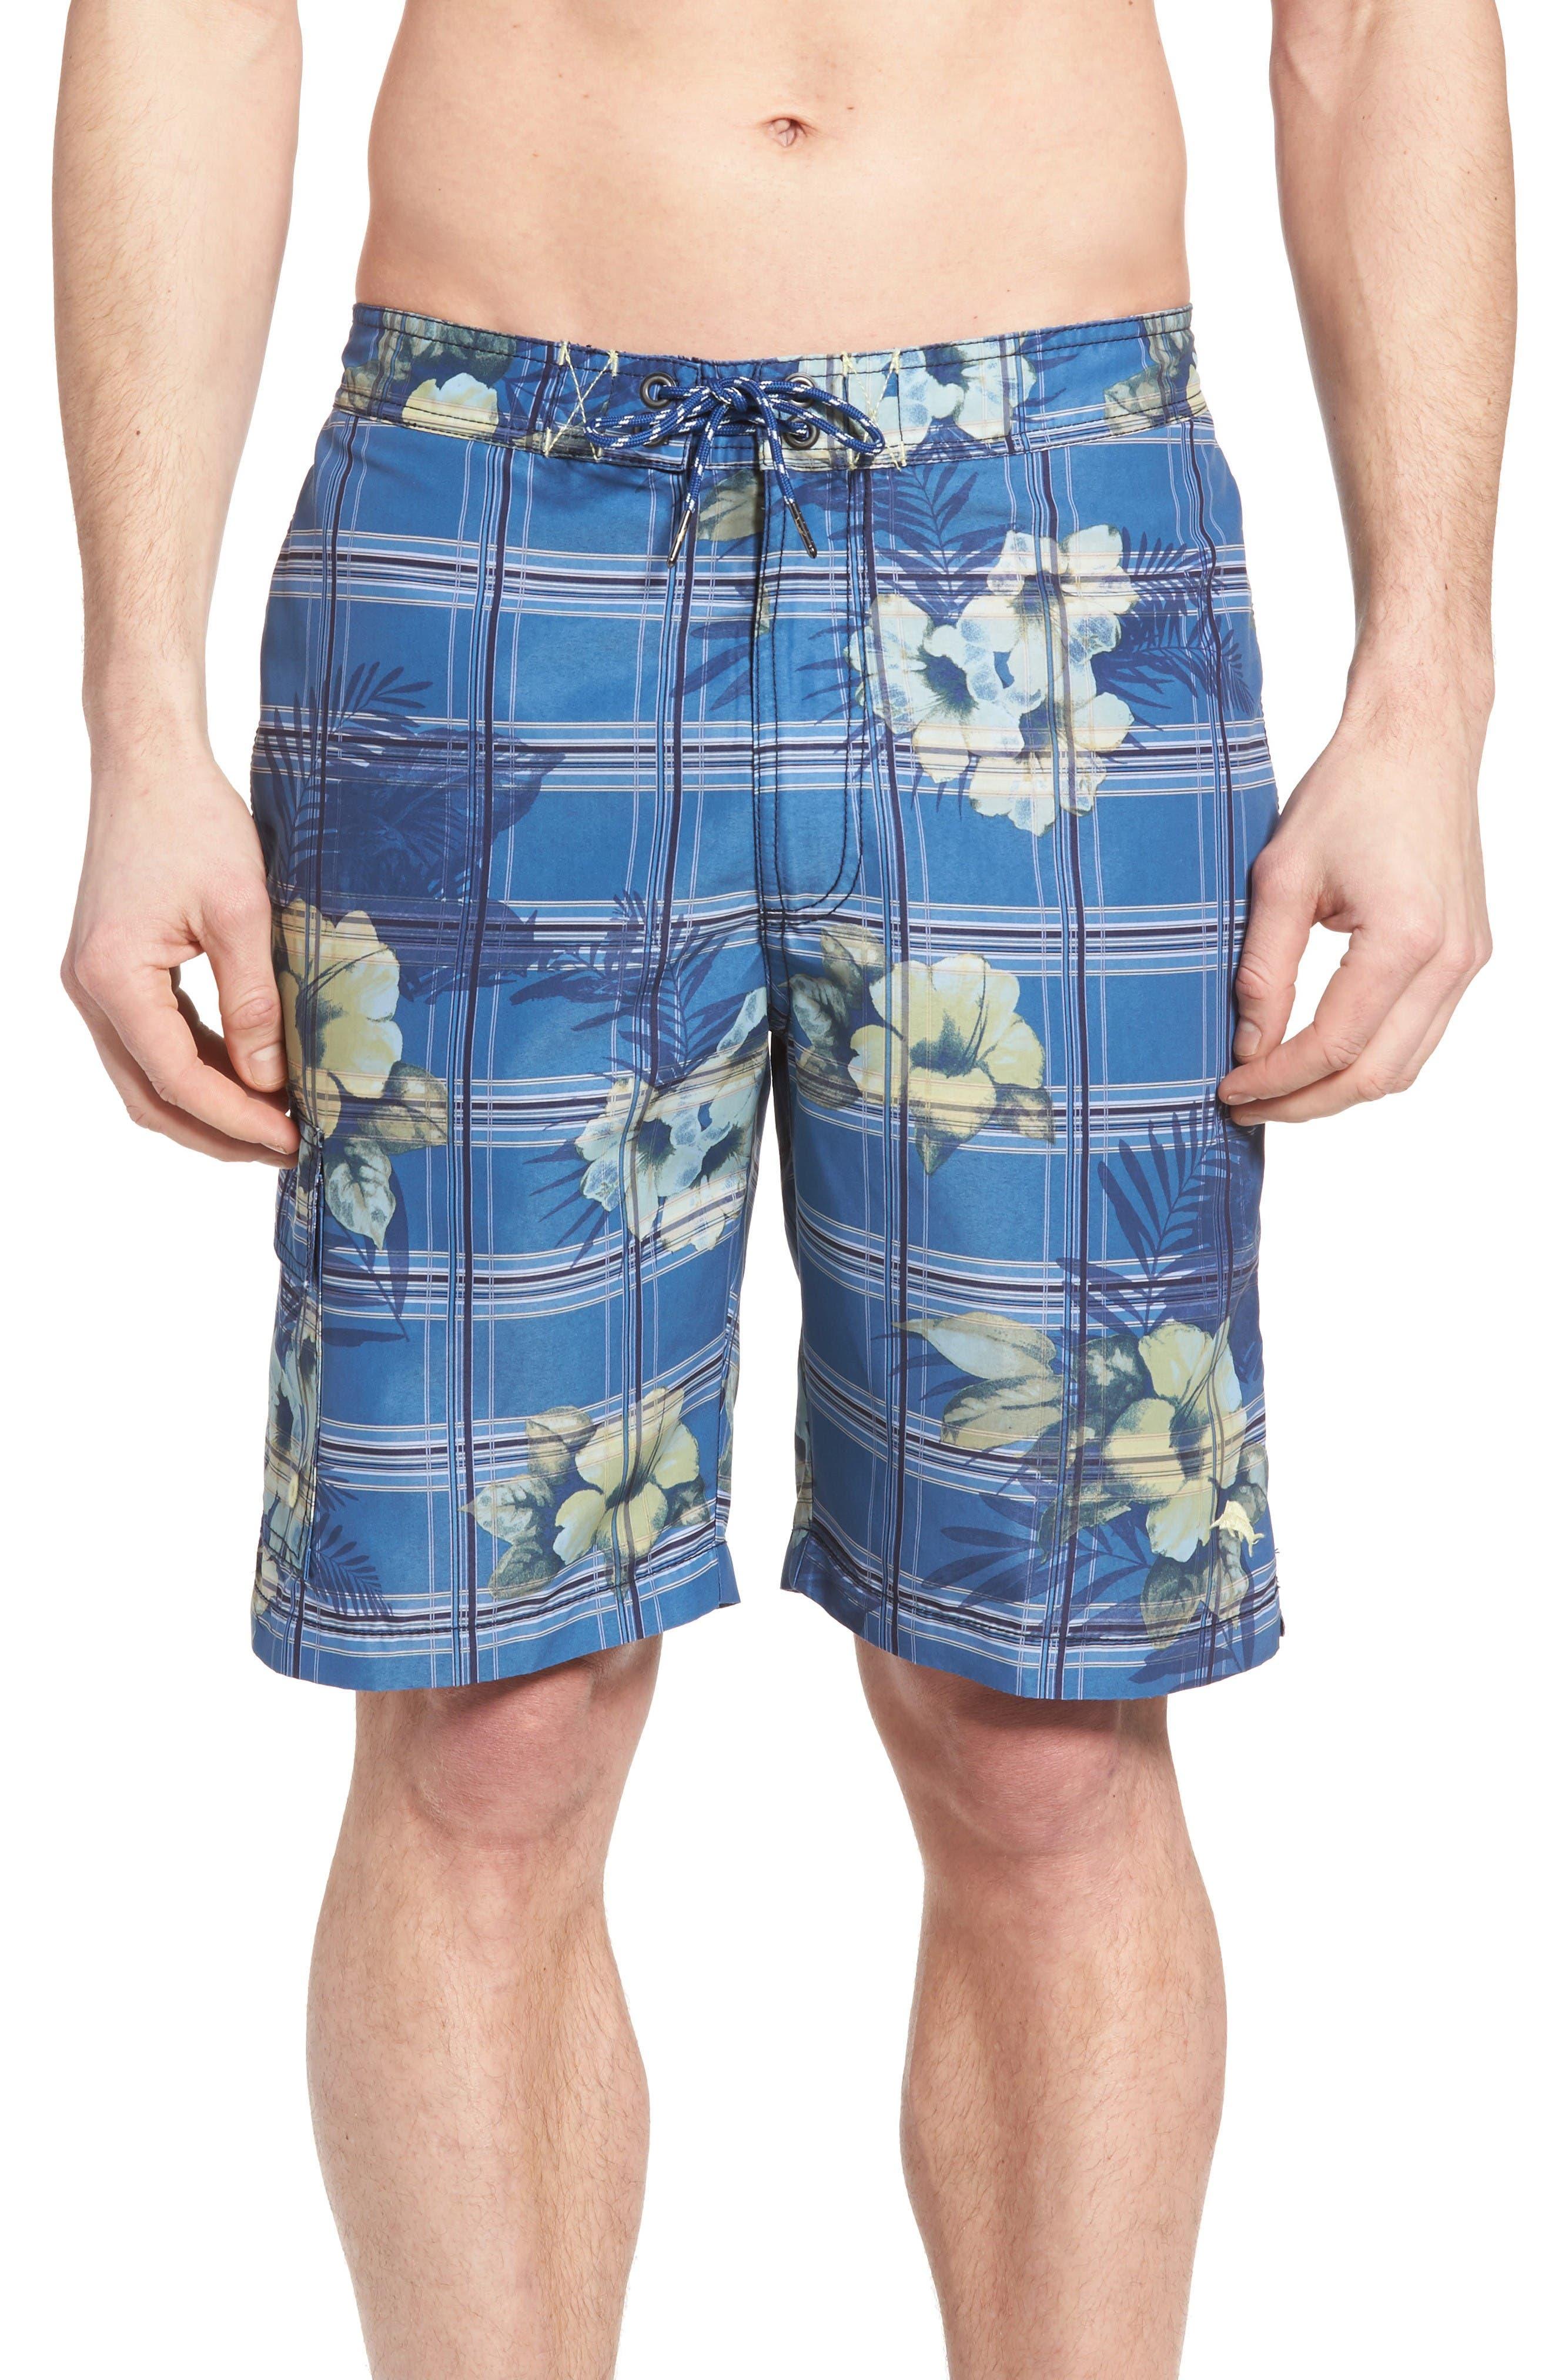 Tommy Bahama Baja House of Plaid Board Shorts (Big & Tall)